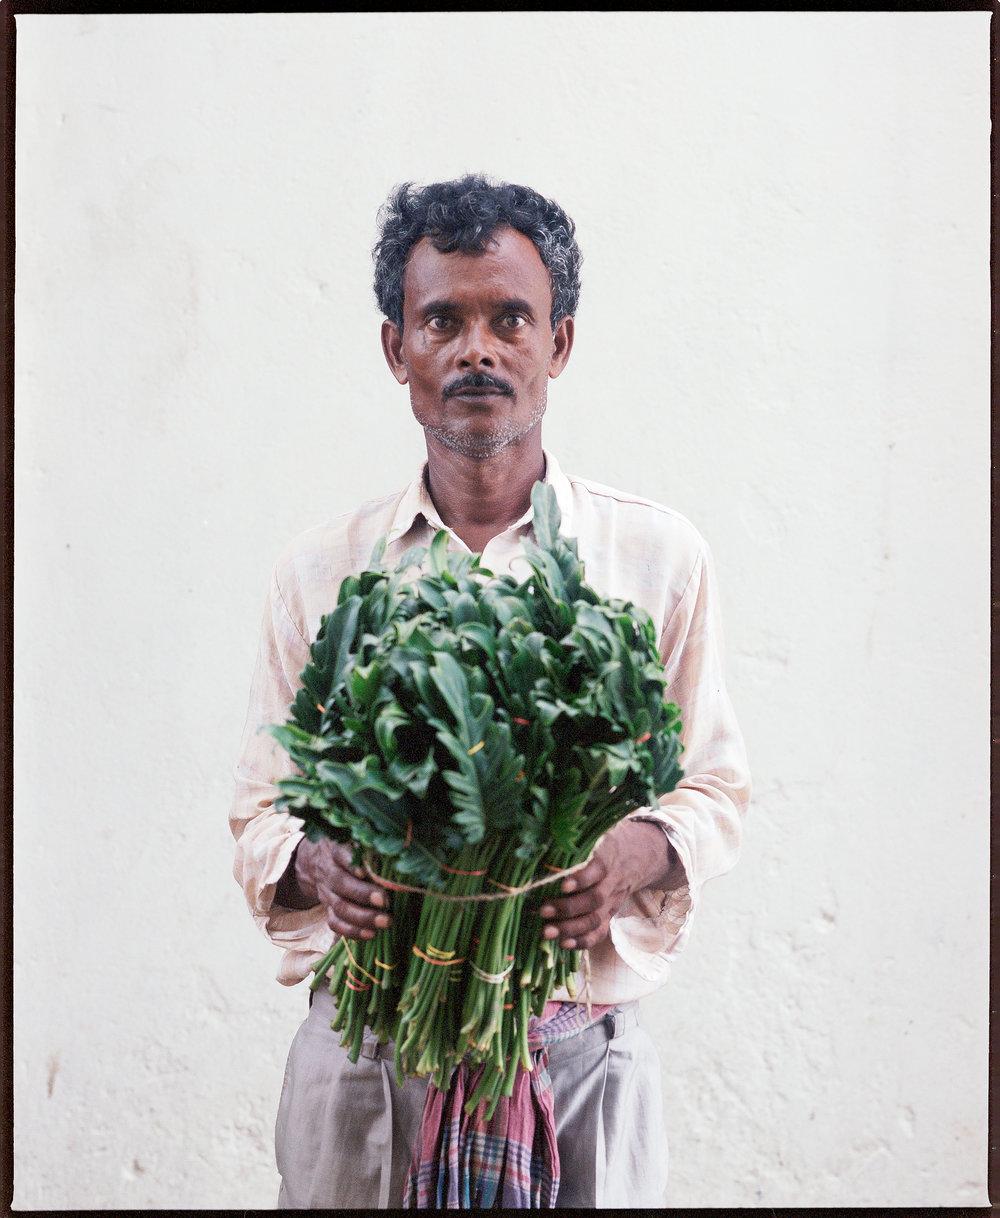 Kolkata_Flowers-11.jpg